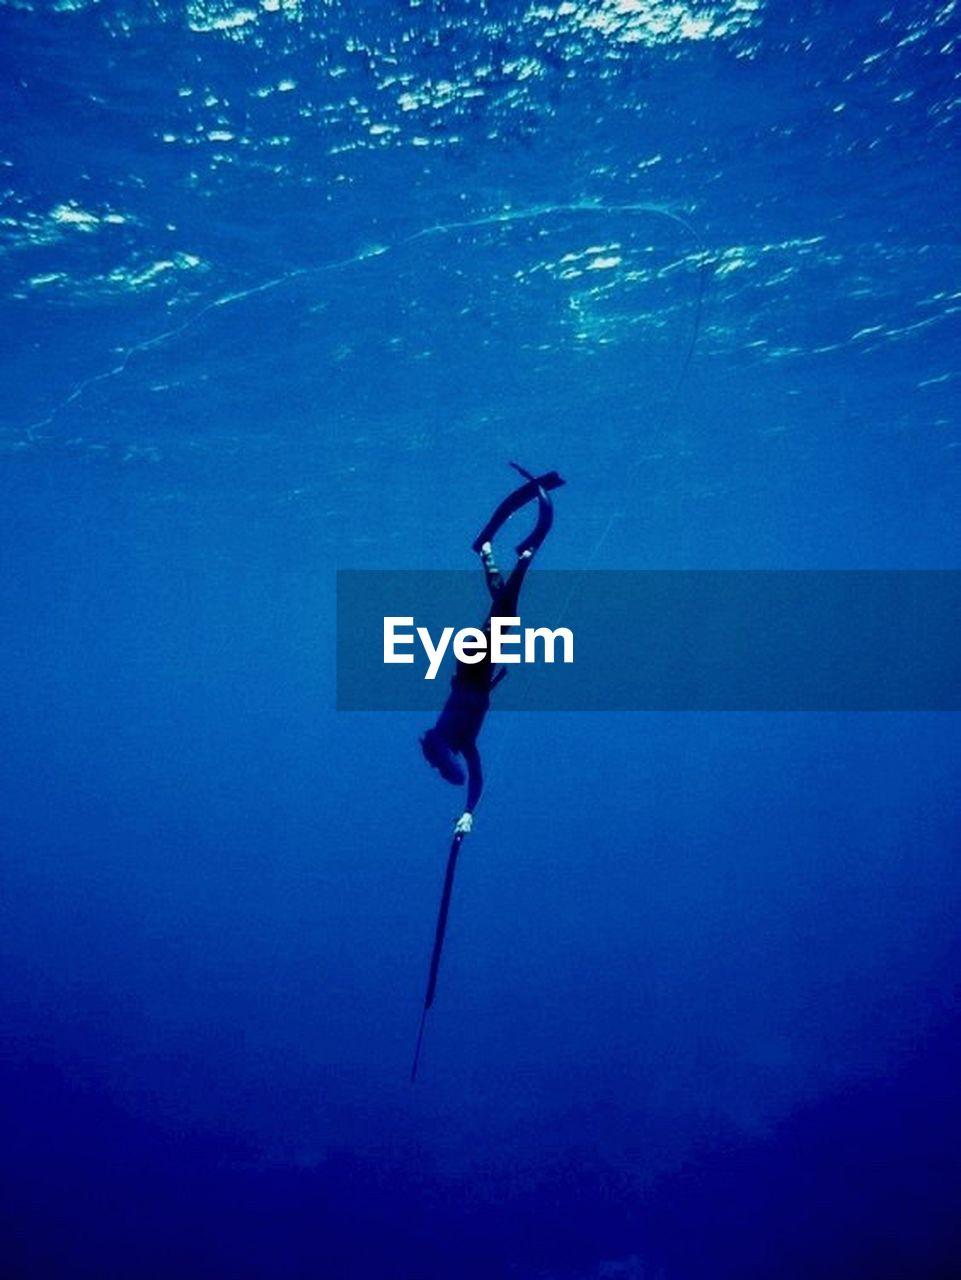 underwater, sea, water, undersea, swimming, blue, aquatic sport, scuba diving, diving equipment, real people, exploration, sport, diving flipper, adventure, nature, one person, leisure activity, unrecognizable person, underwater diving, marine